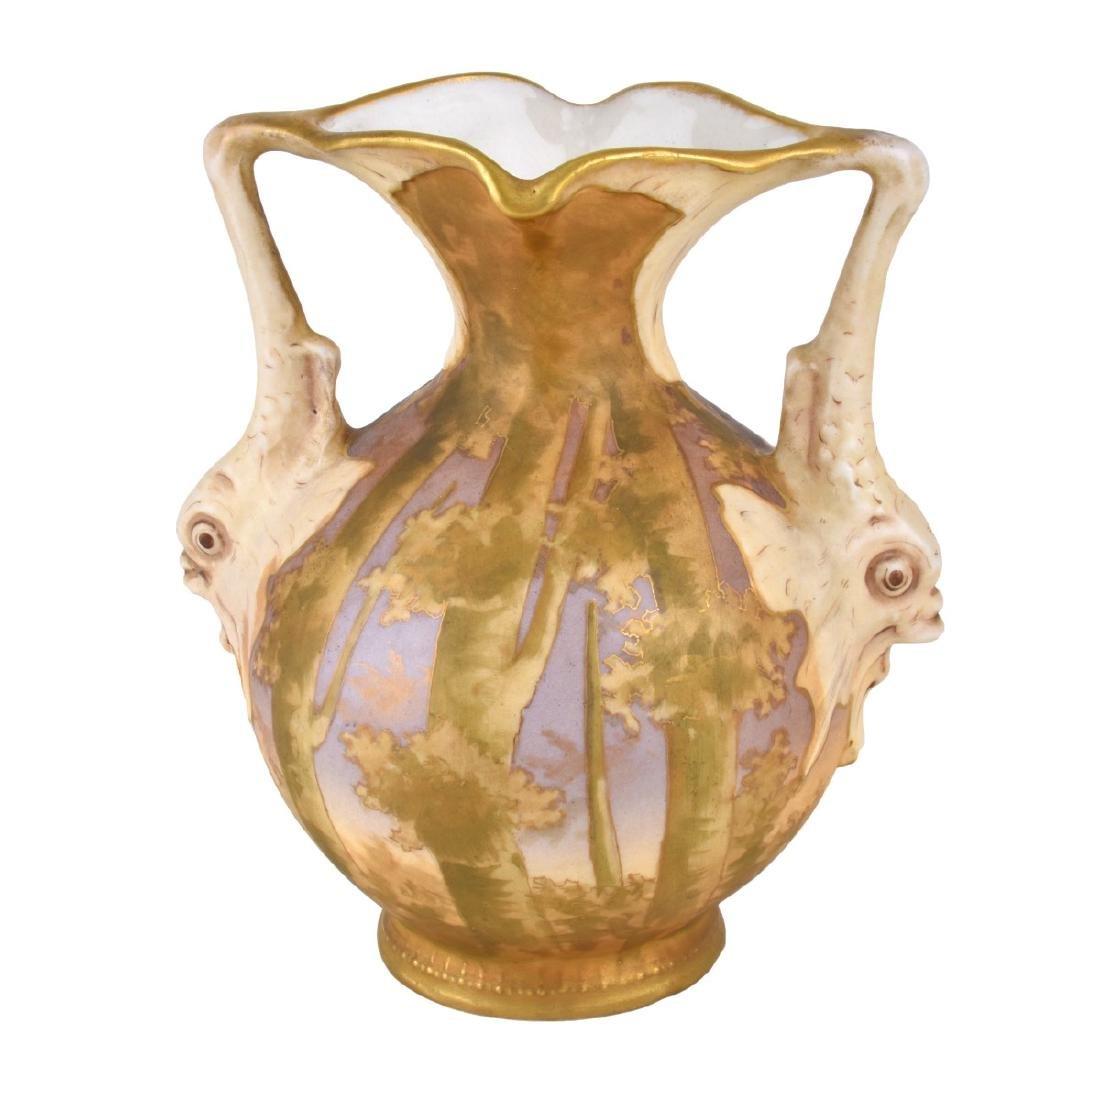 Turn Teplitz Amphora Dolphin Vase